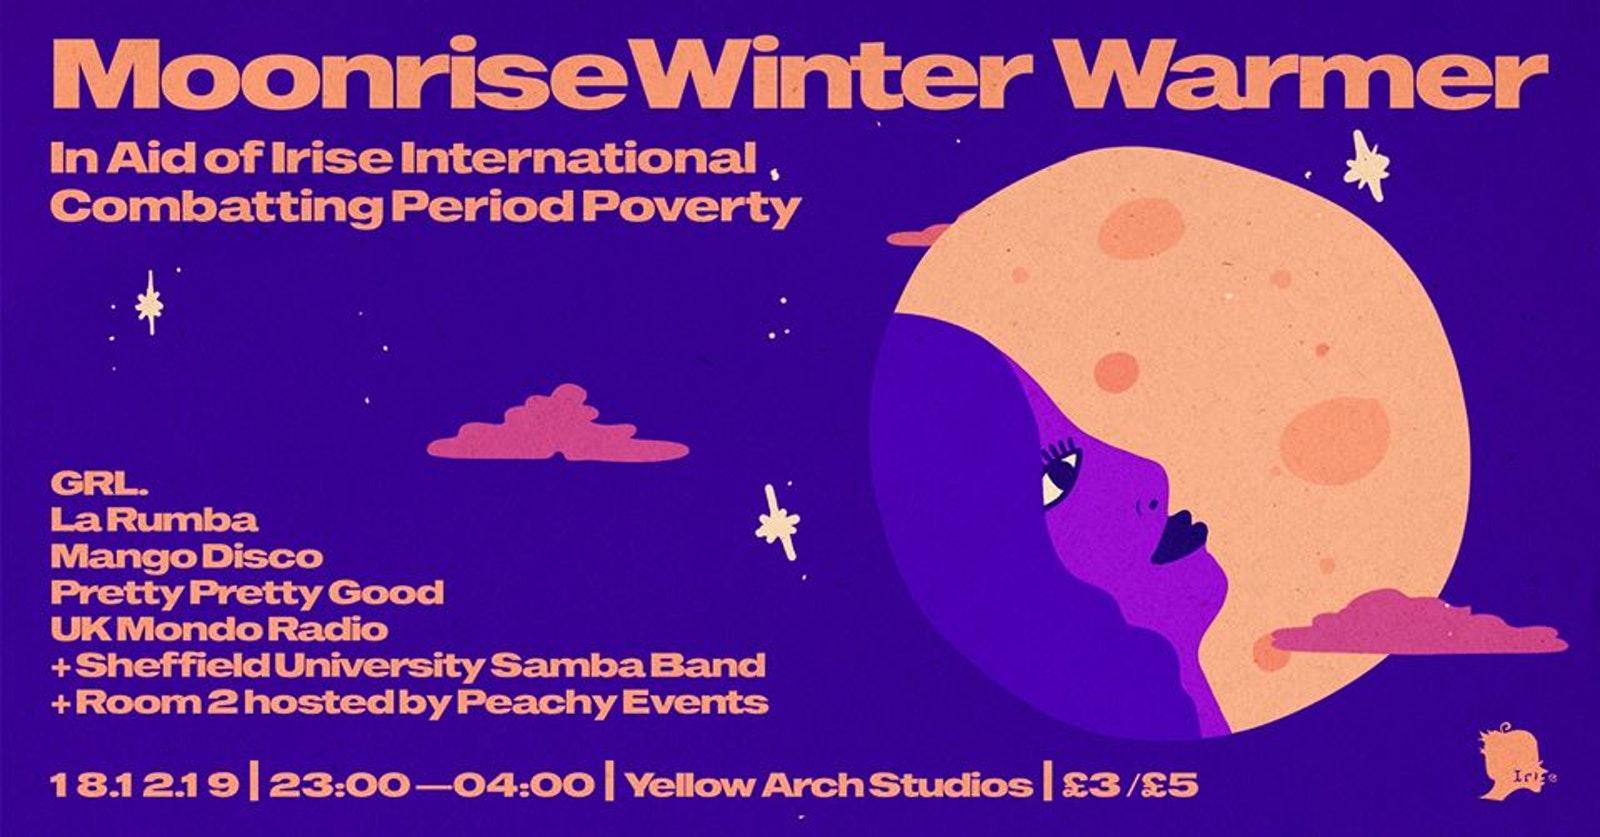 Moonrise Winter Warmer